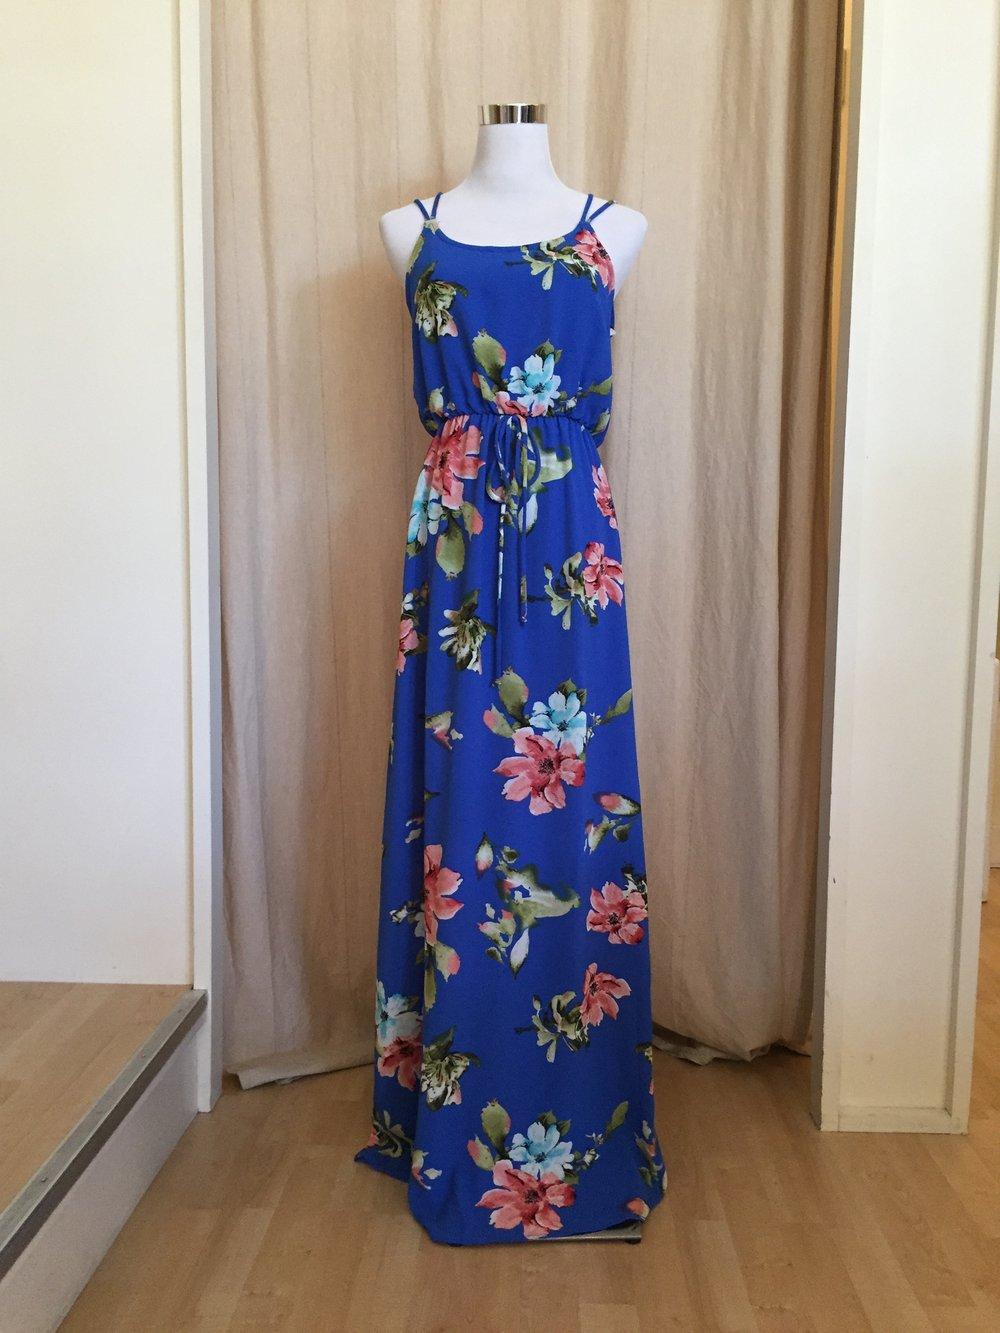 Strappy Floral Maxi, $48